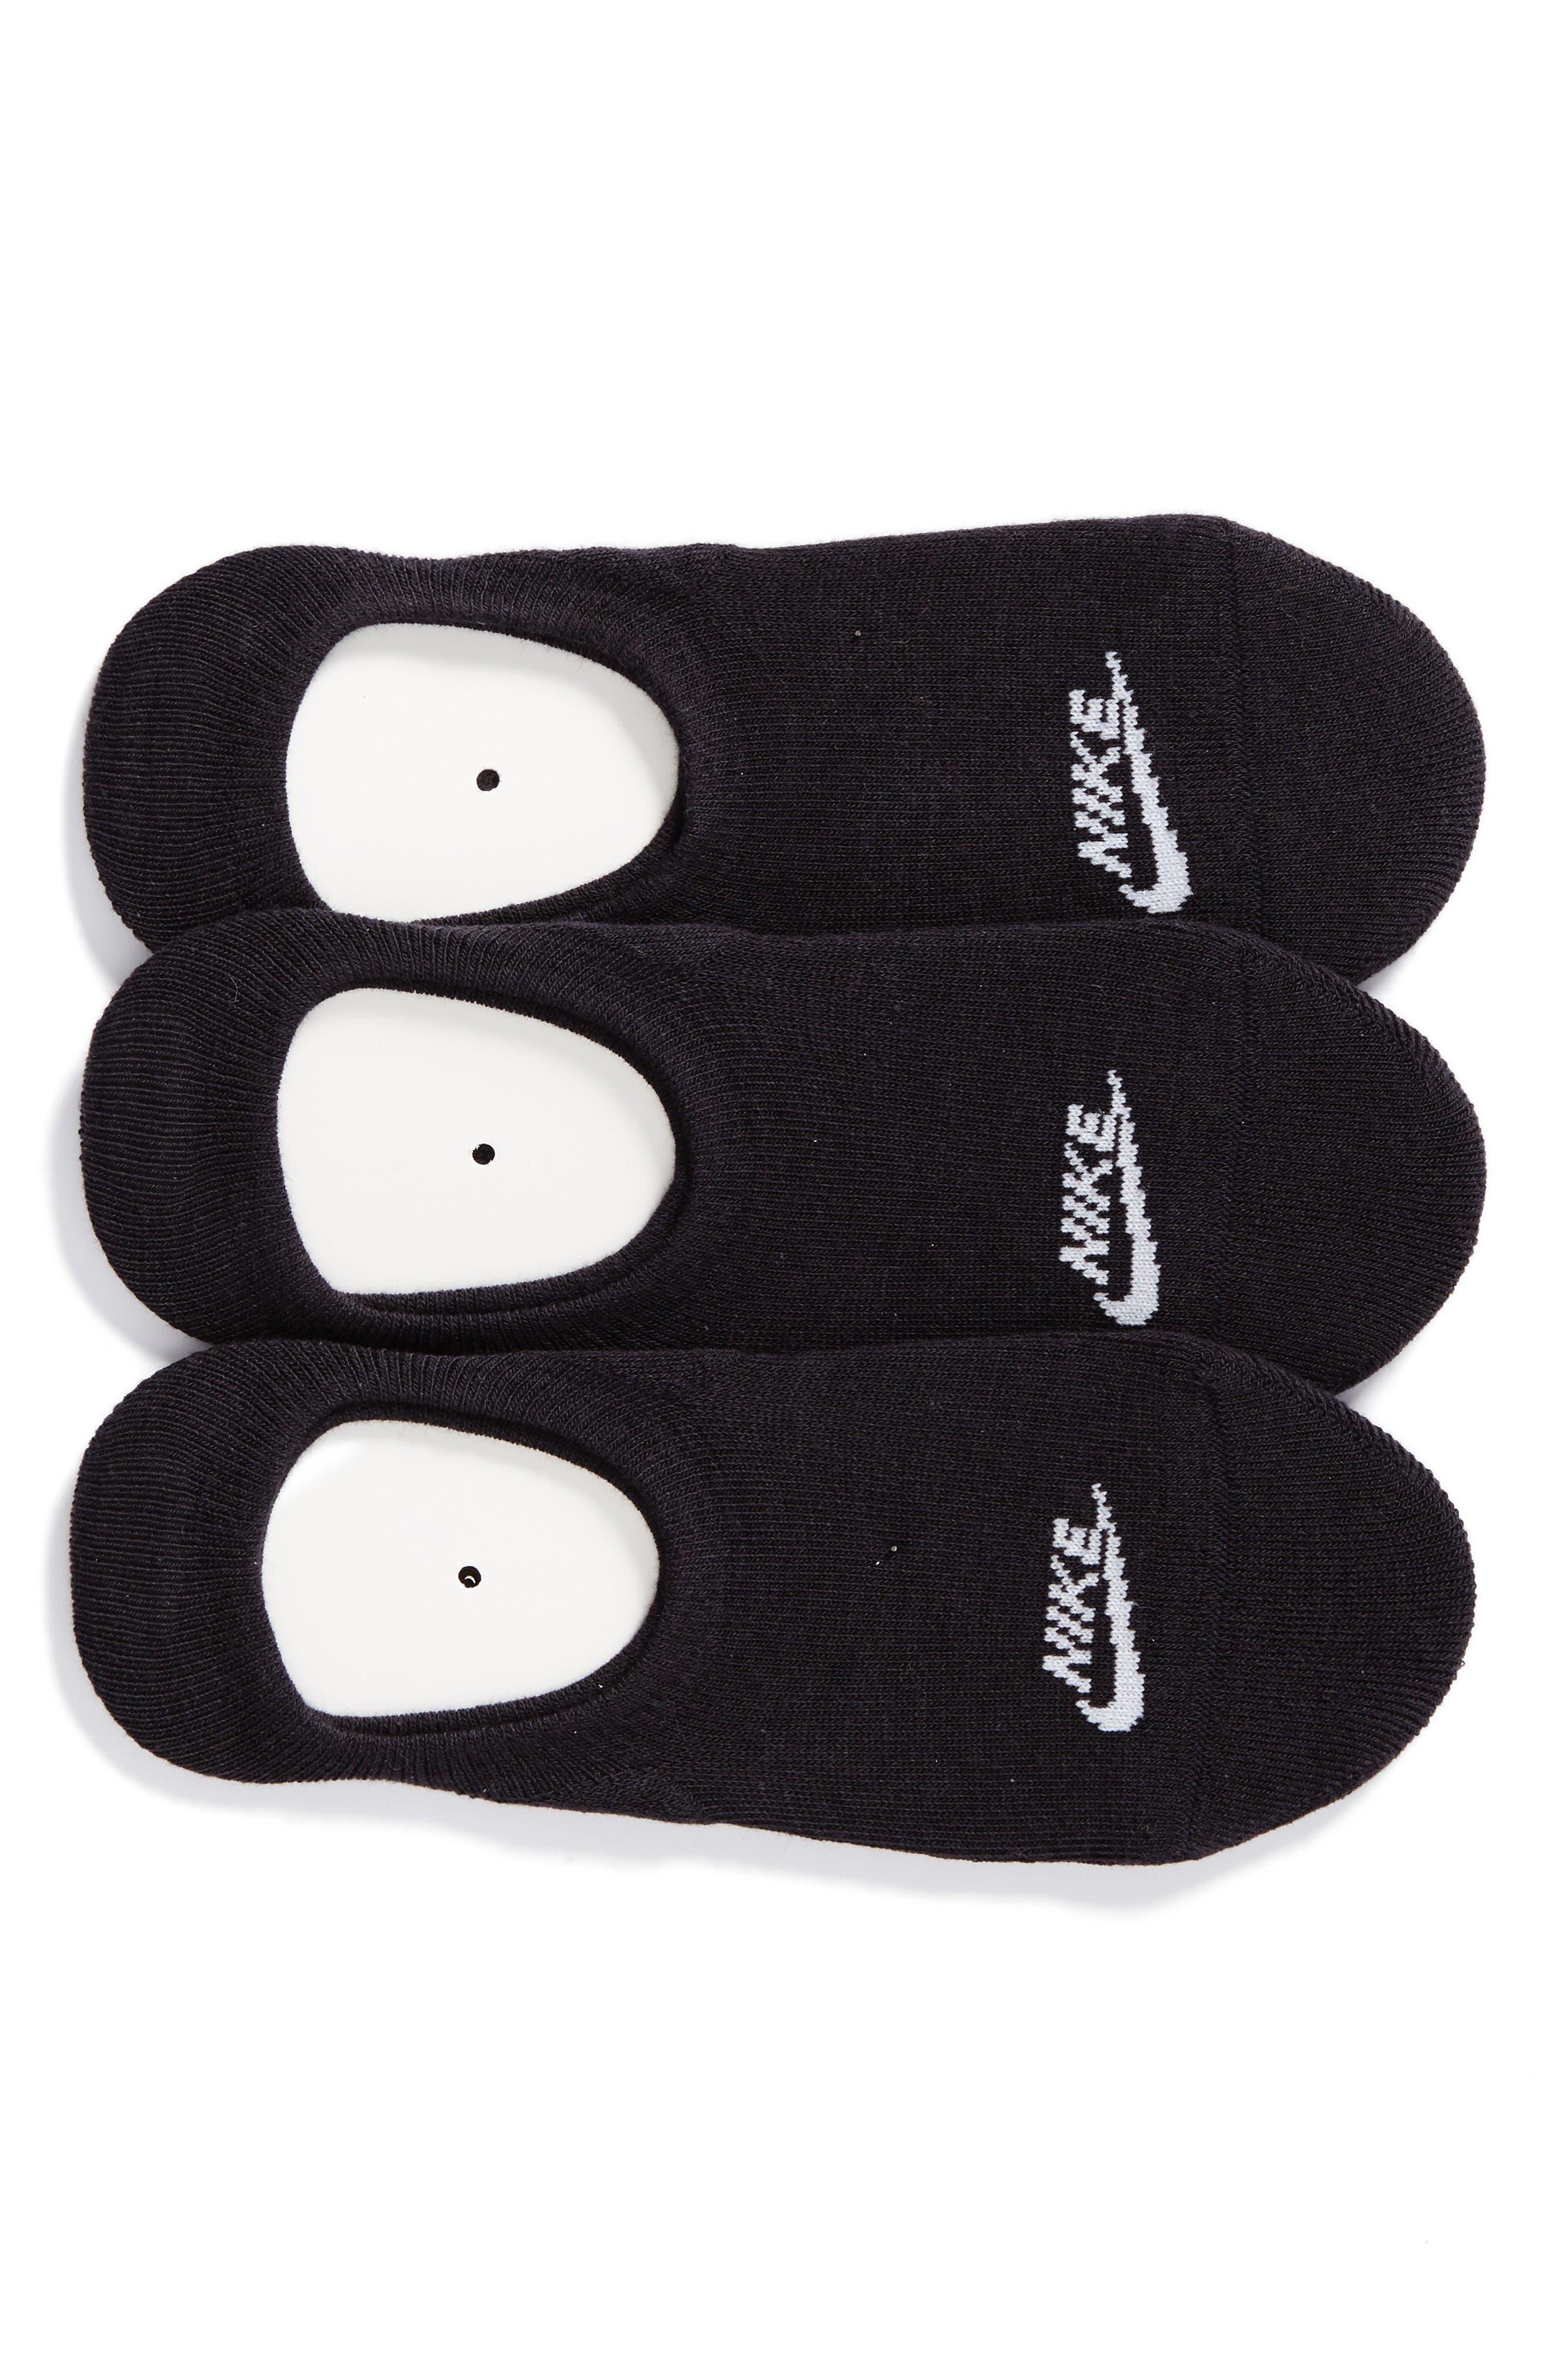 3-Pack No-Show Training Socks,                         Main,                         color, Black